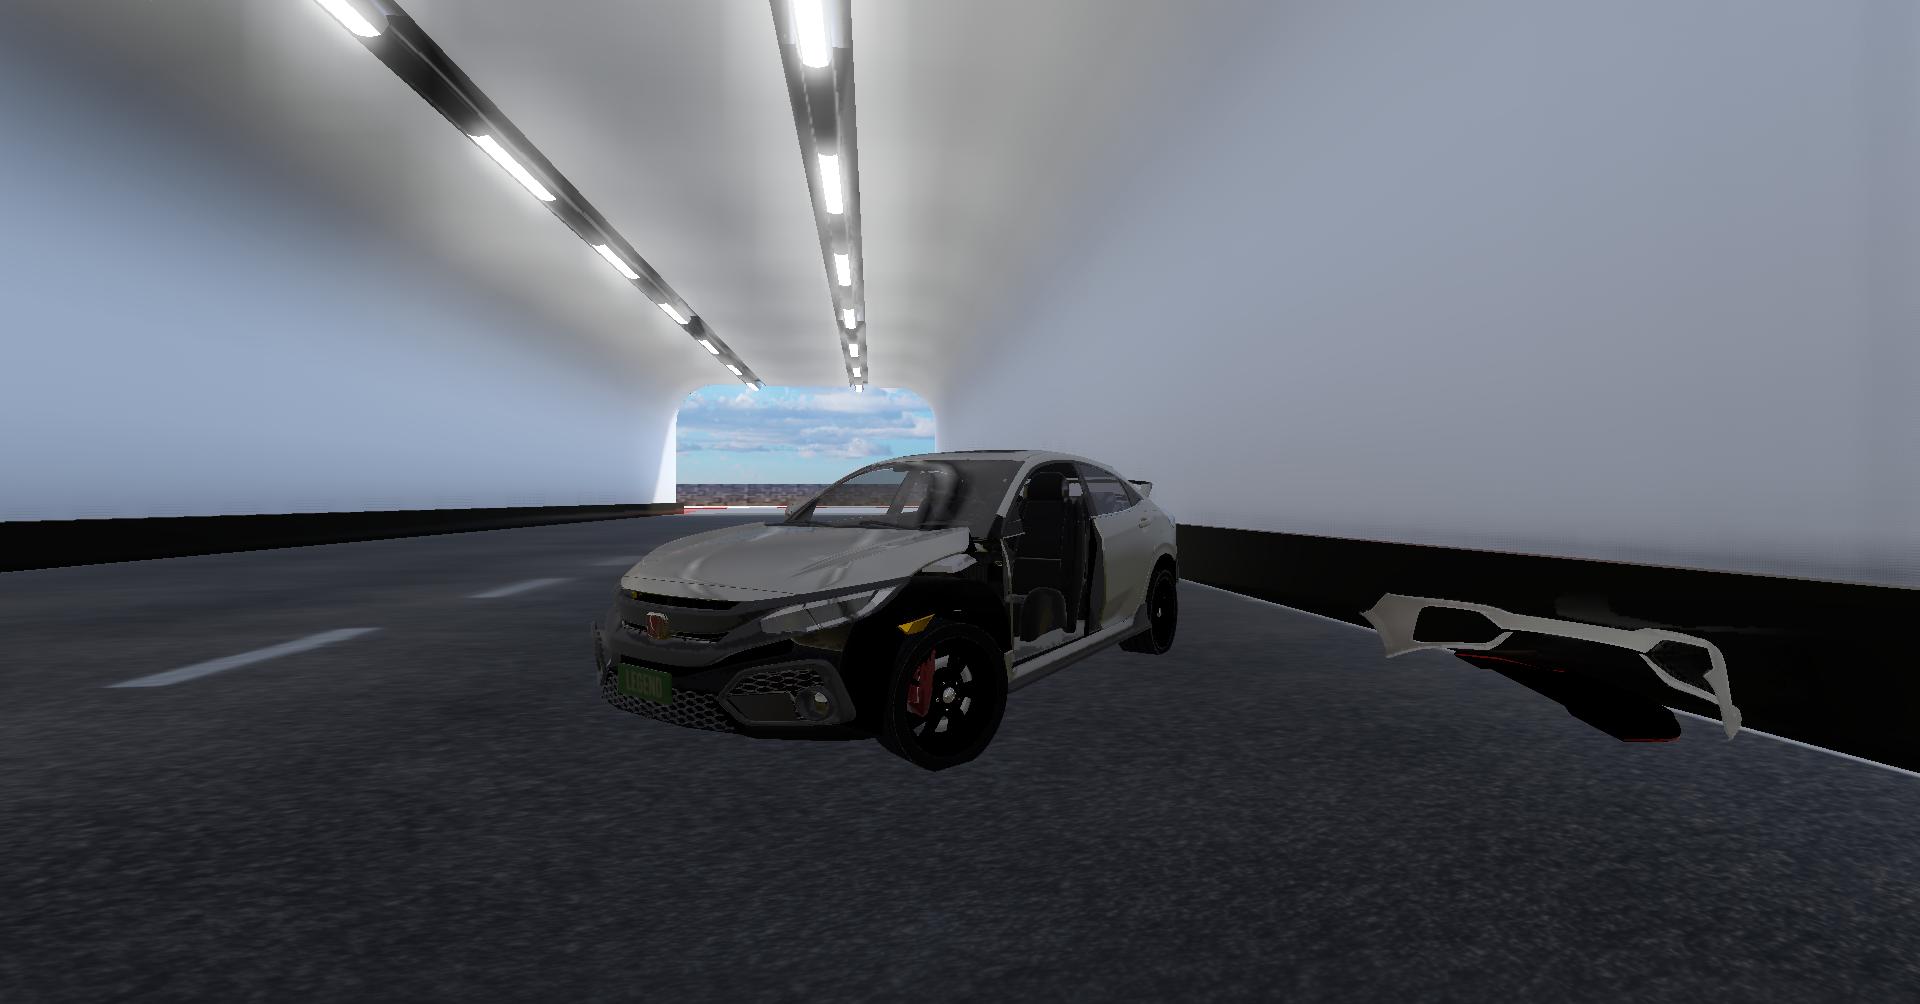 Component Based Car Destruction System's icon